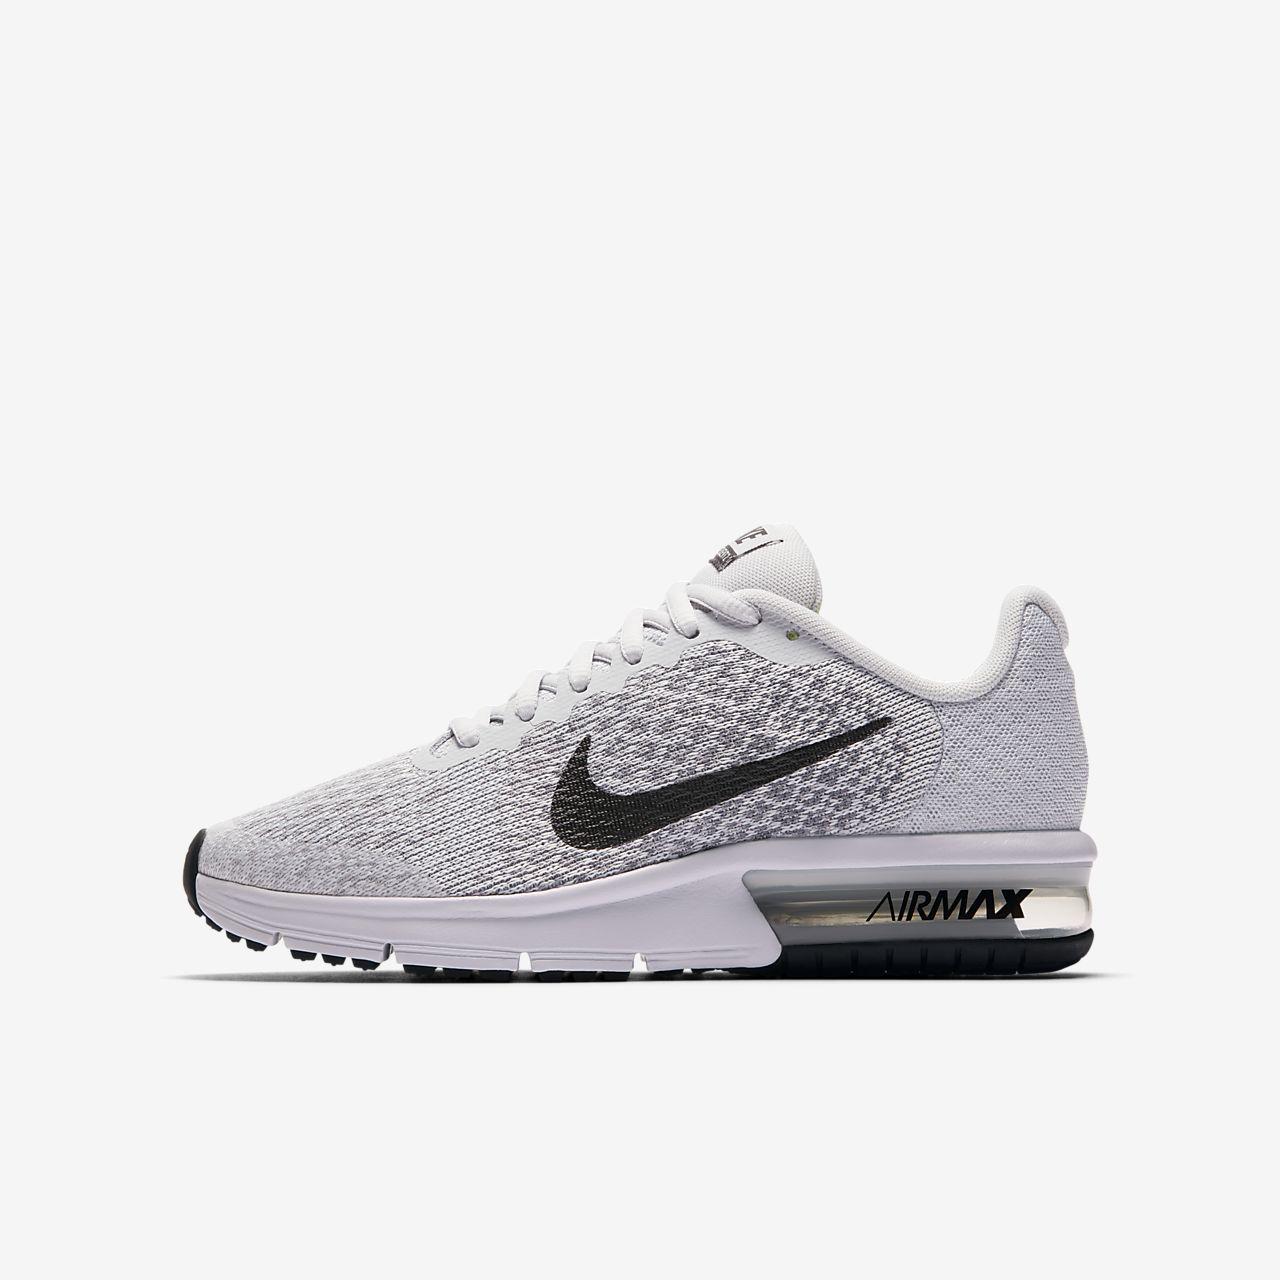 Nike Laufschuhe Günstig Kaufen (126010INXL)   Nike Air Max